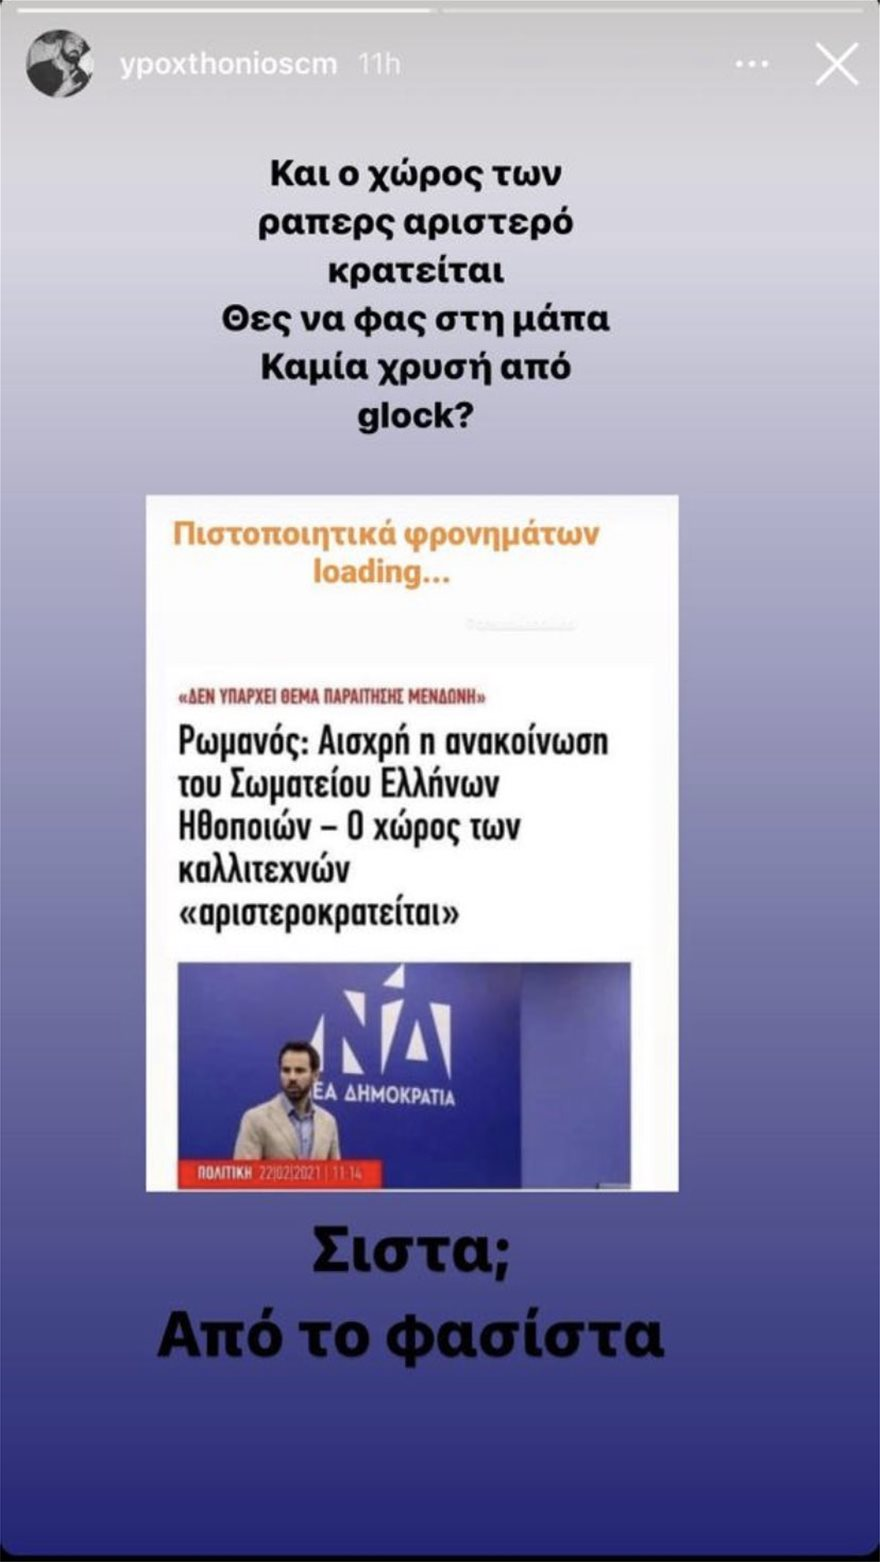 ypohthonios_anartisi_insta